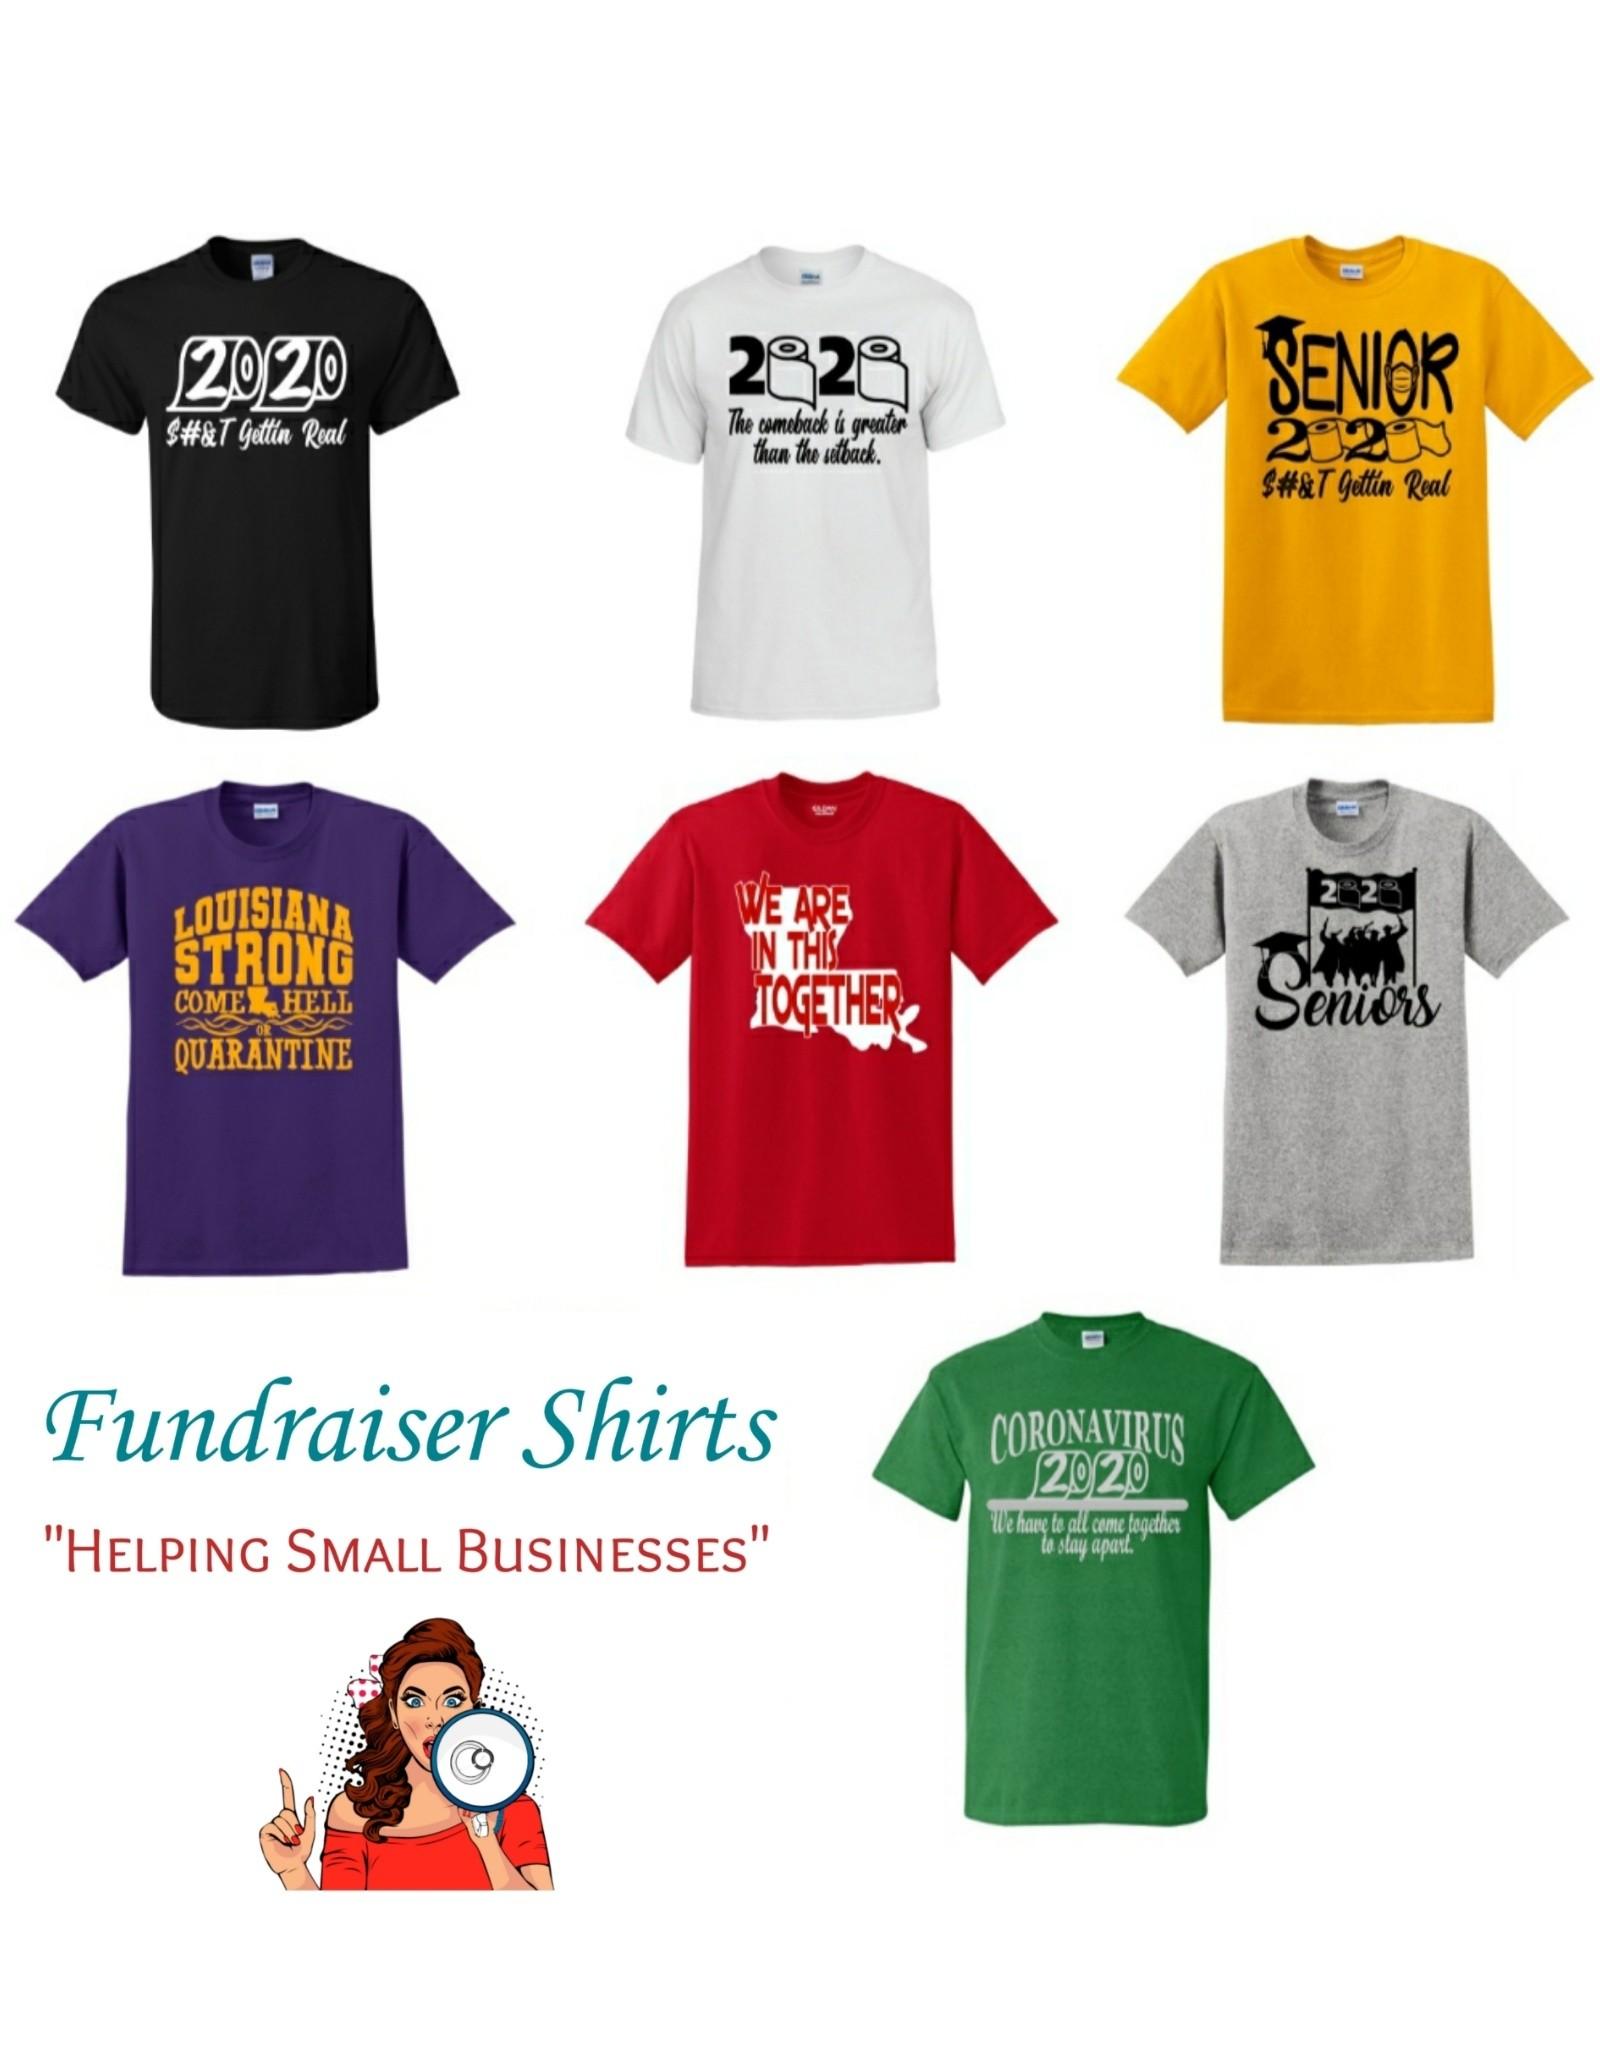 2020 Fundraiser Shirts